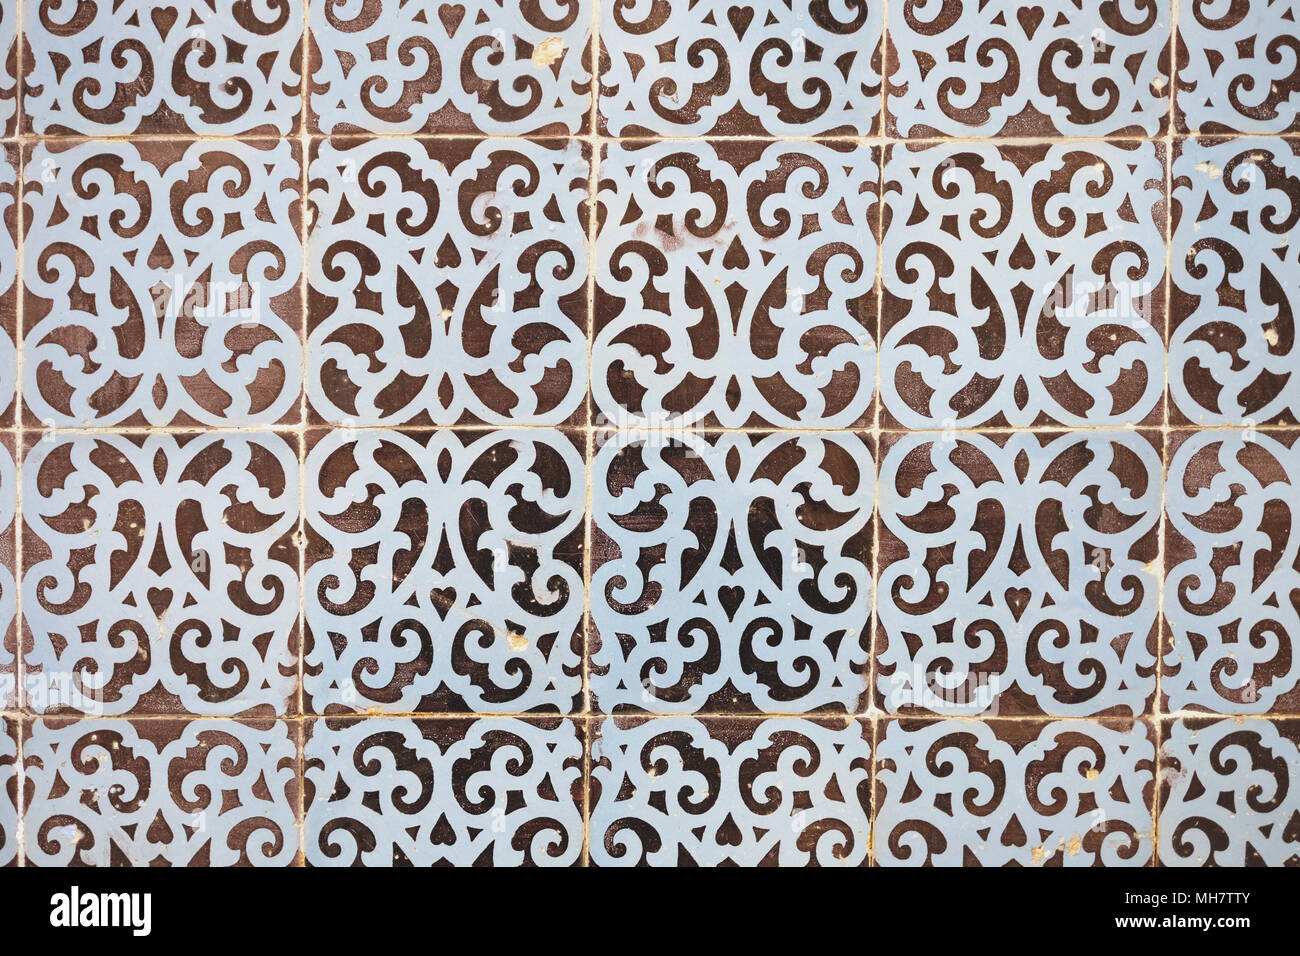 Piastrelle di ceramica colorate immagini piastrelle di ceramica